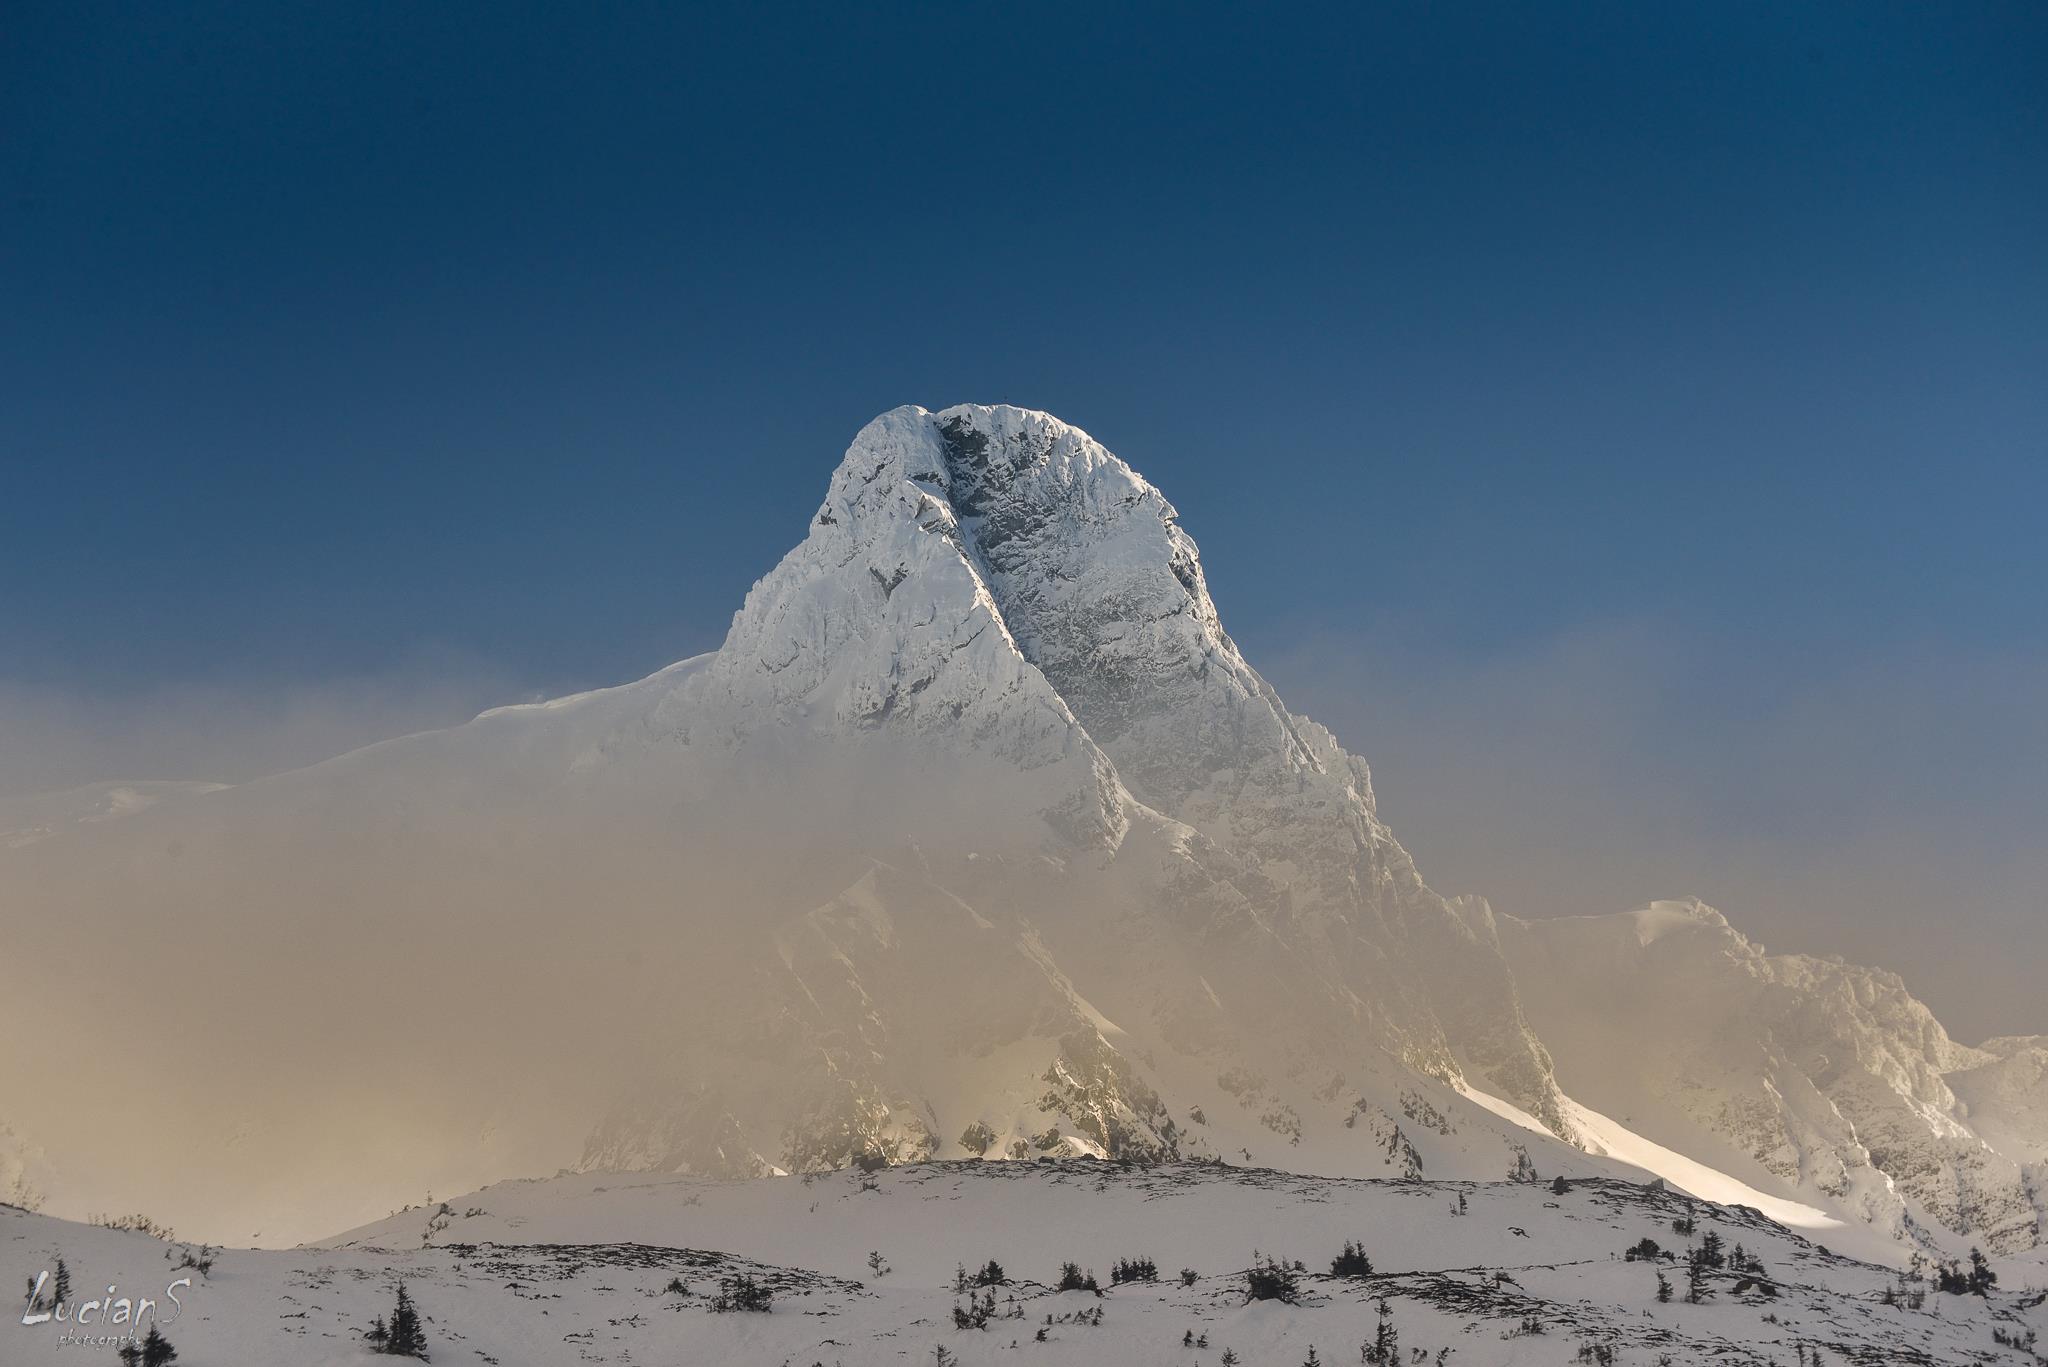 Matterhorn-ul Romaniei - Coltul Balaceni - Lucian Satmarean